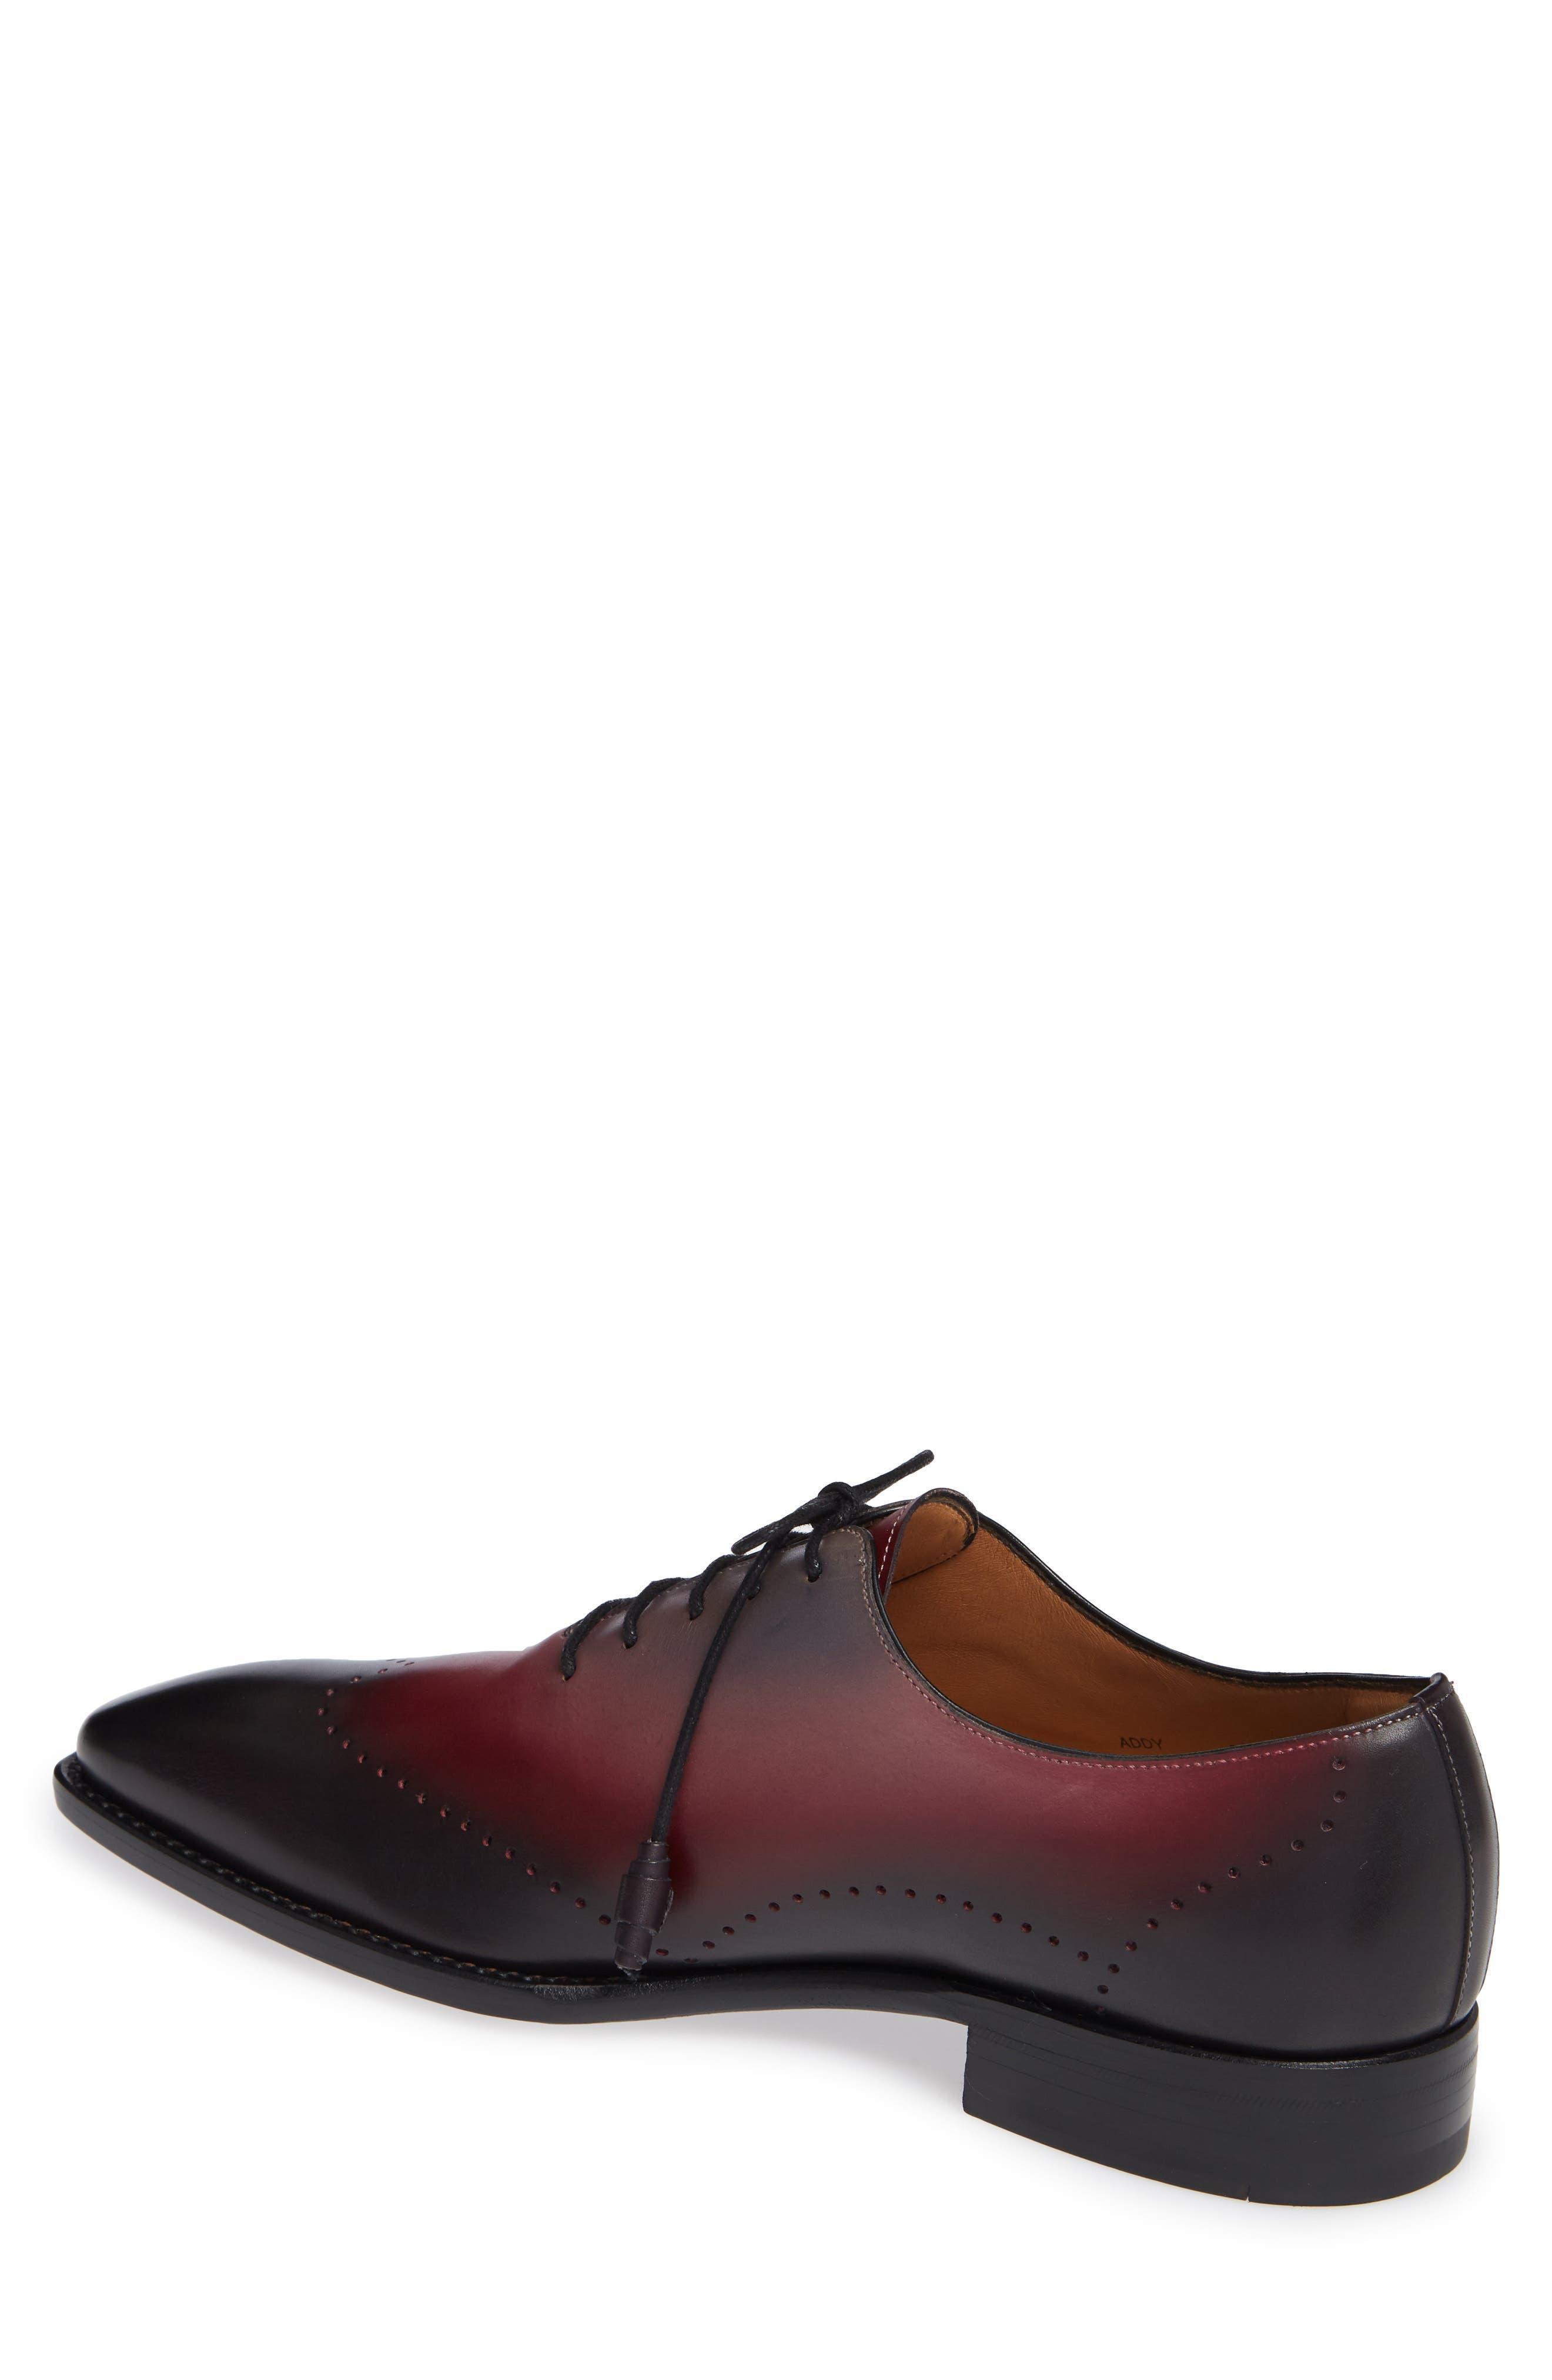 Addy Wingtip Whole Cut Shoe,                             Alternate thumbnail 2, color,                             BLACK LEATHER